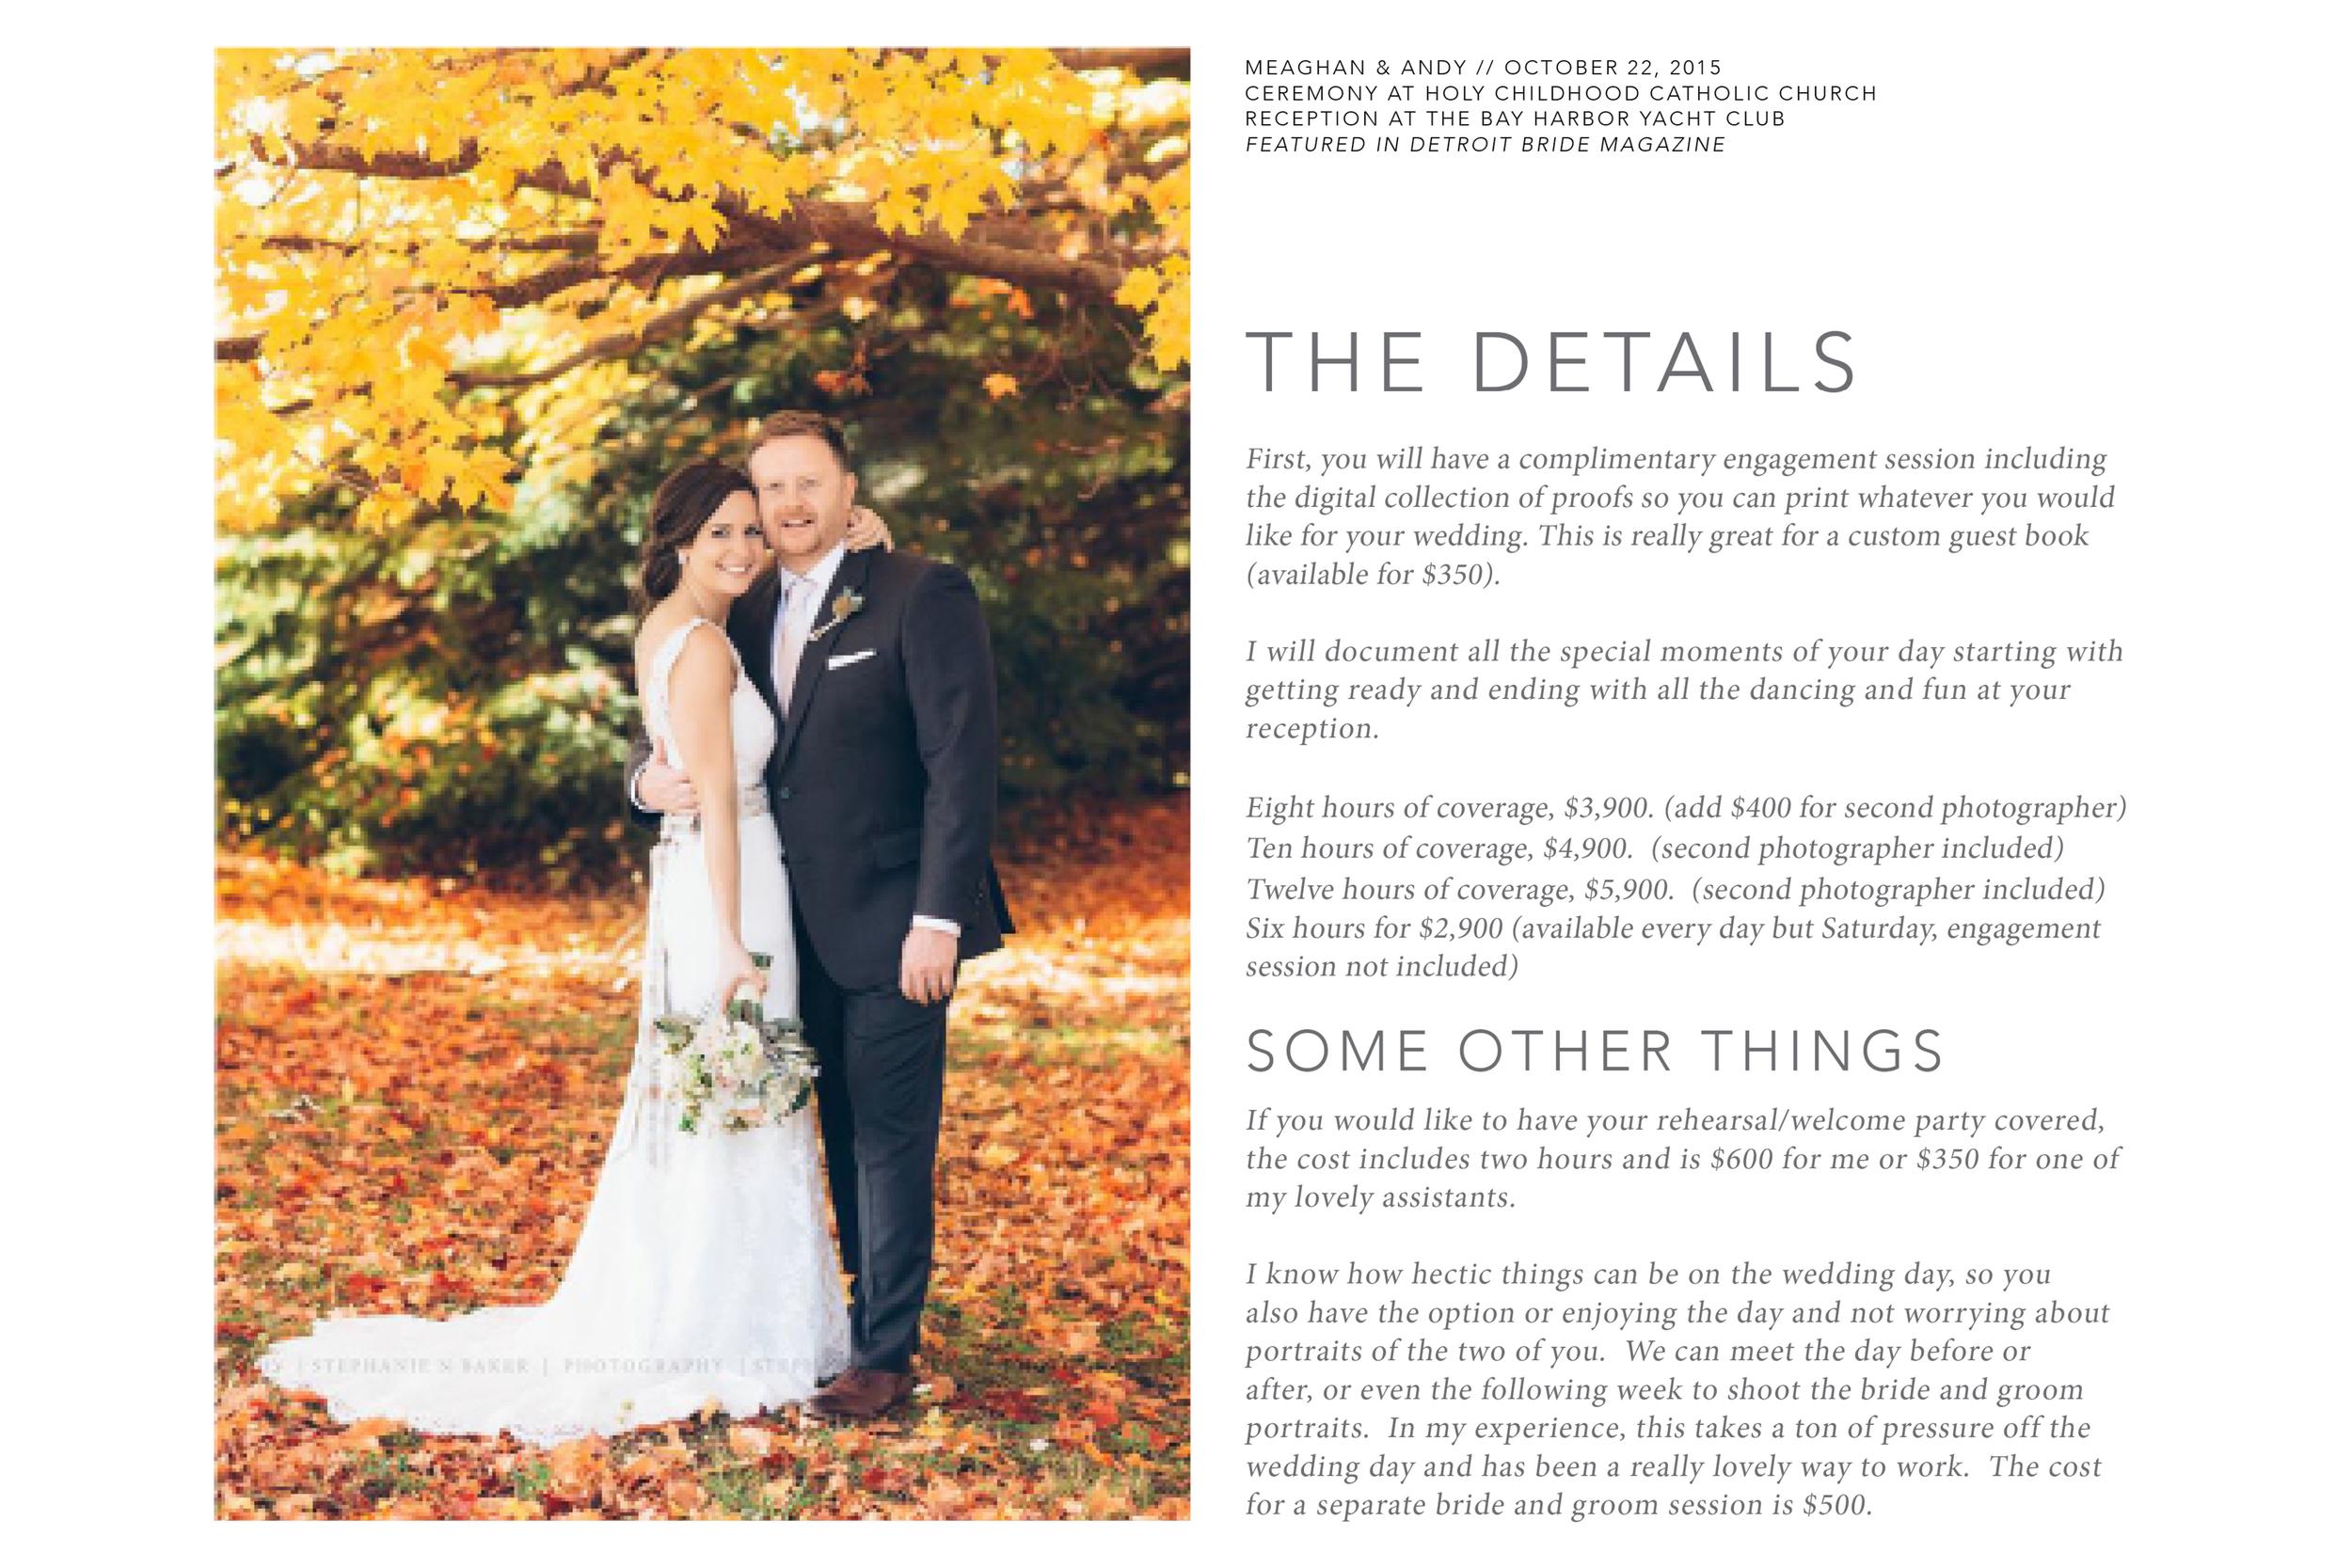 2016wedding-guide3.jpg